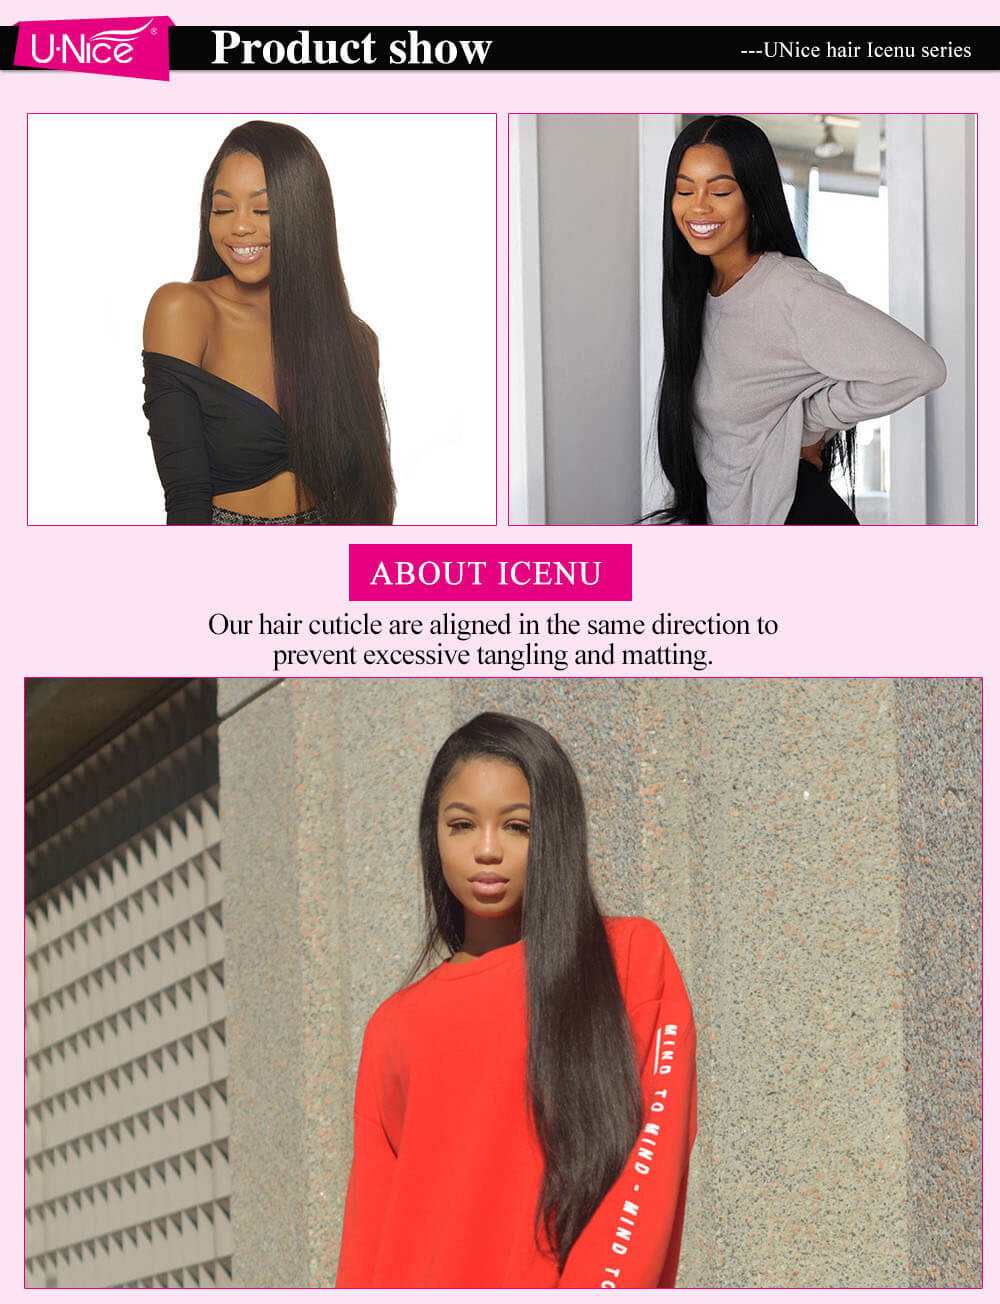 UNice hair icenu series straight hair customer show